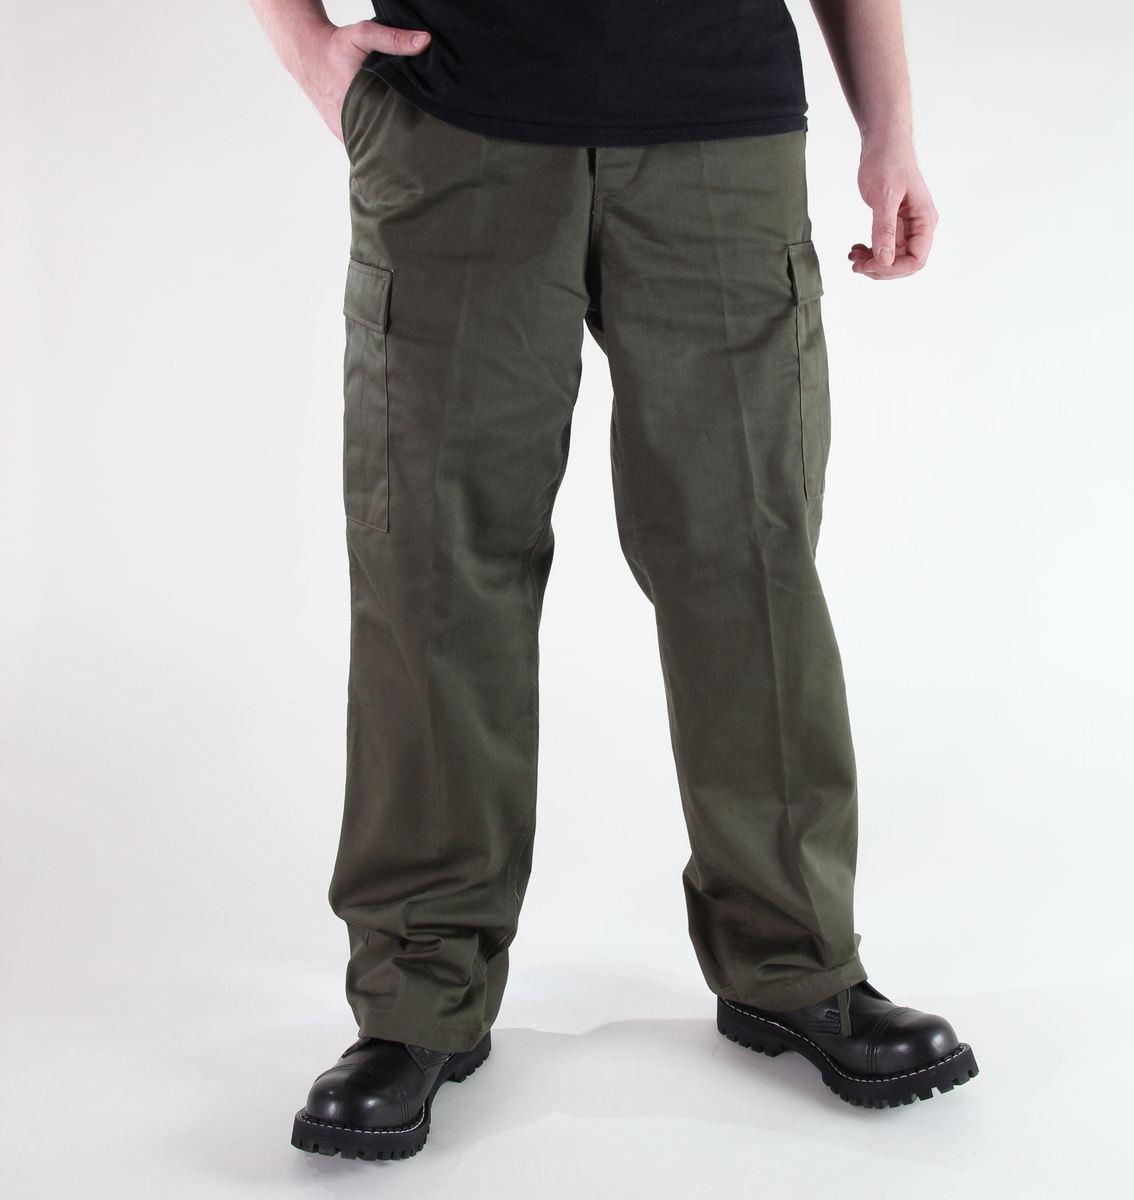 kalhoty pánské MIL-TEC - US Ranger Hose - Oliv - 11810001